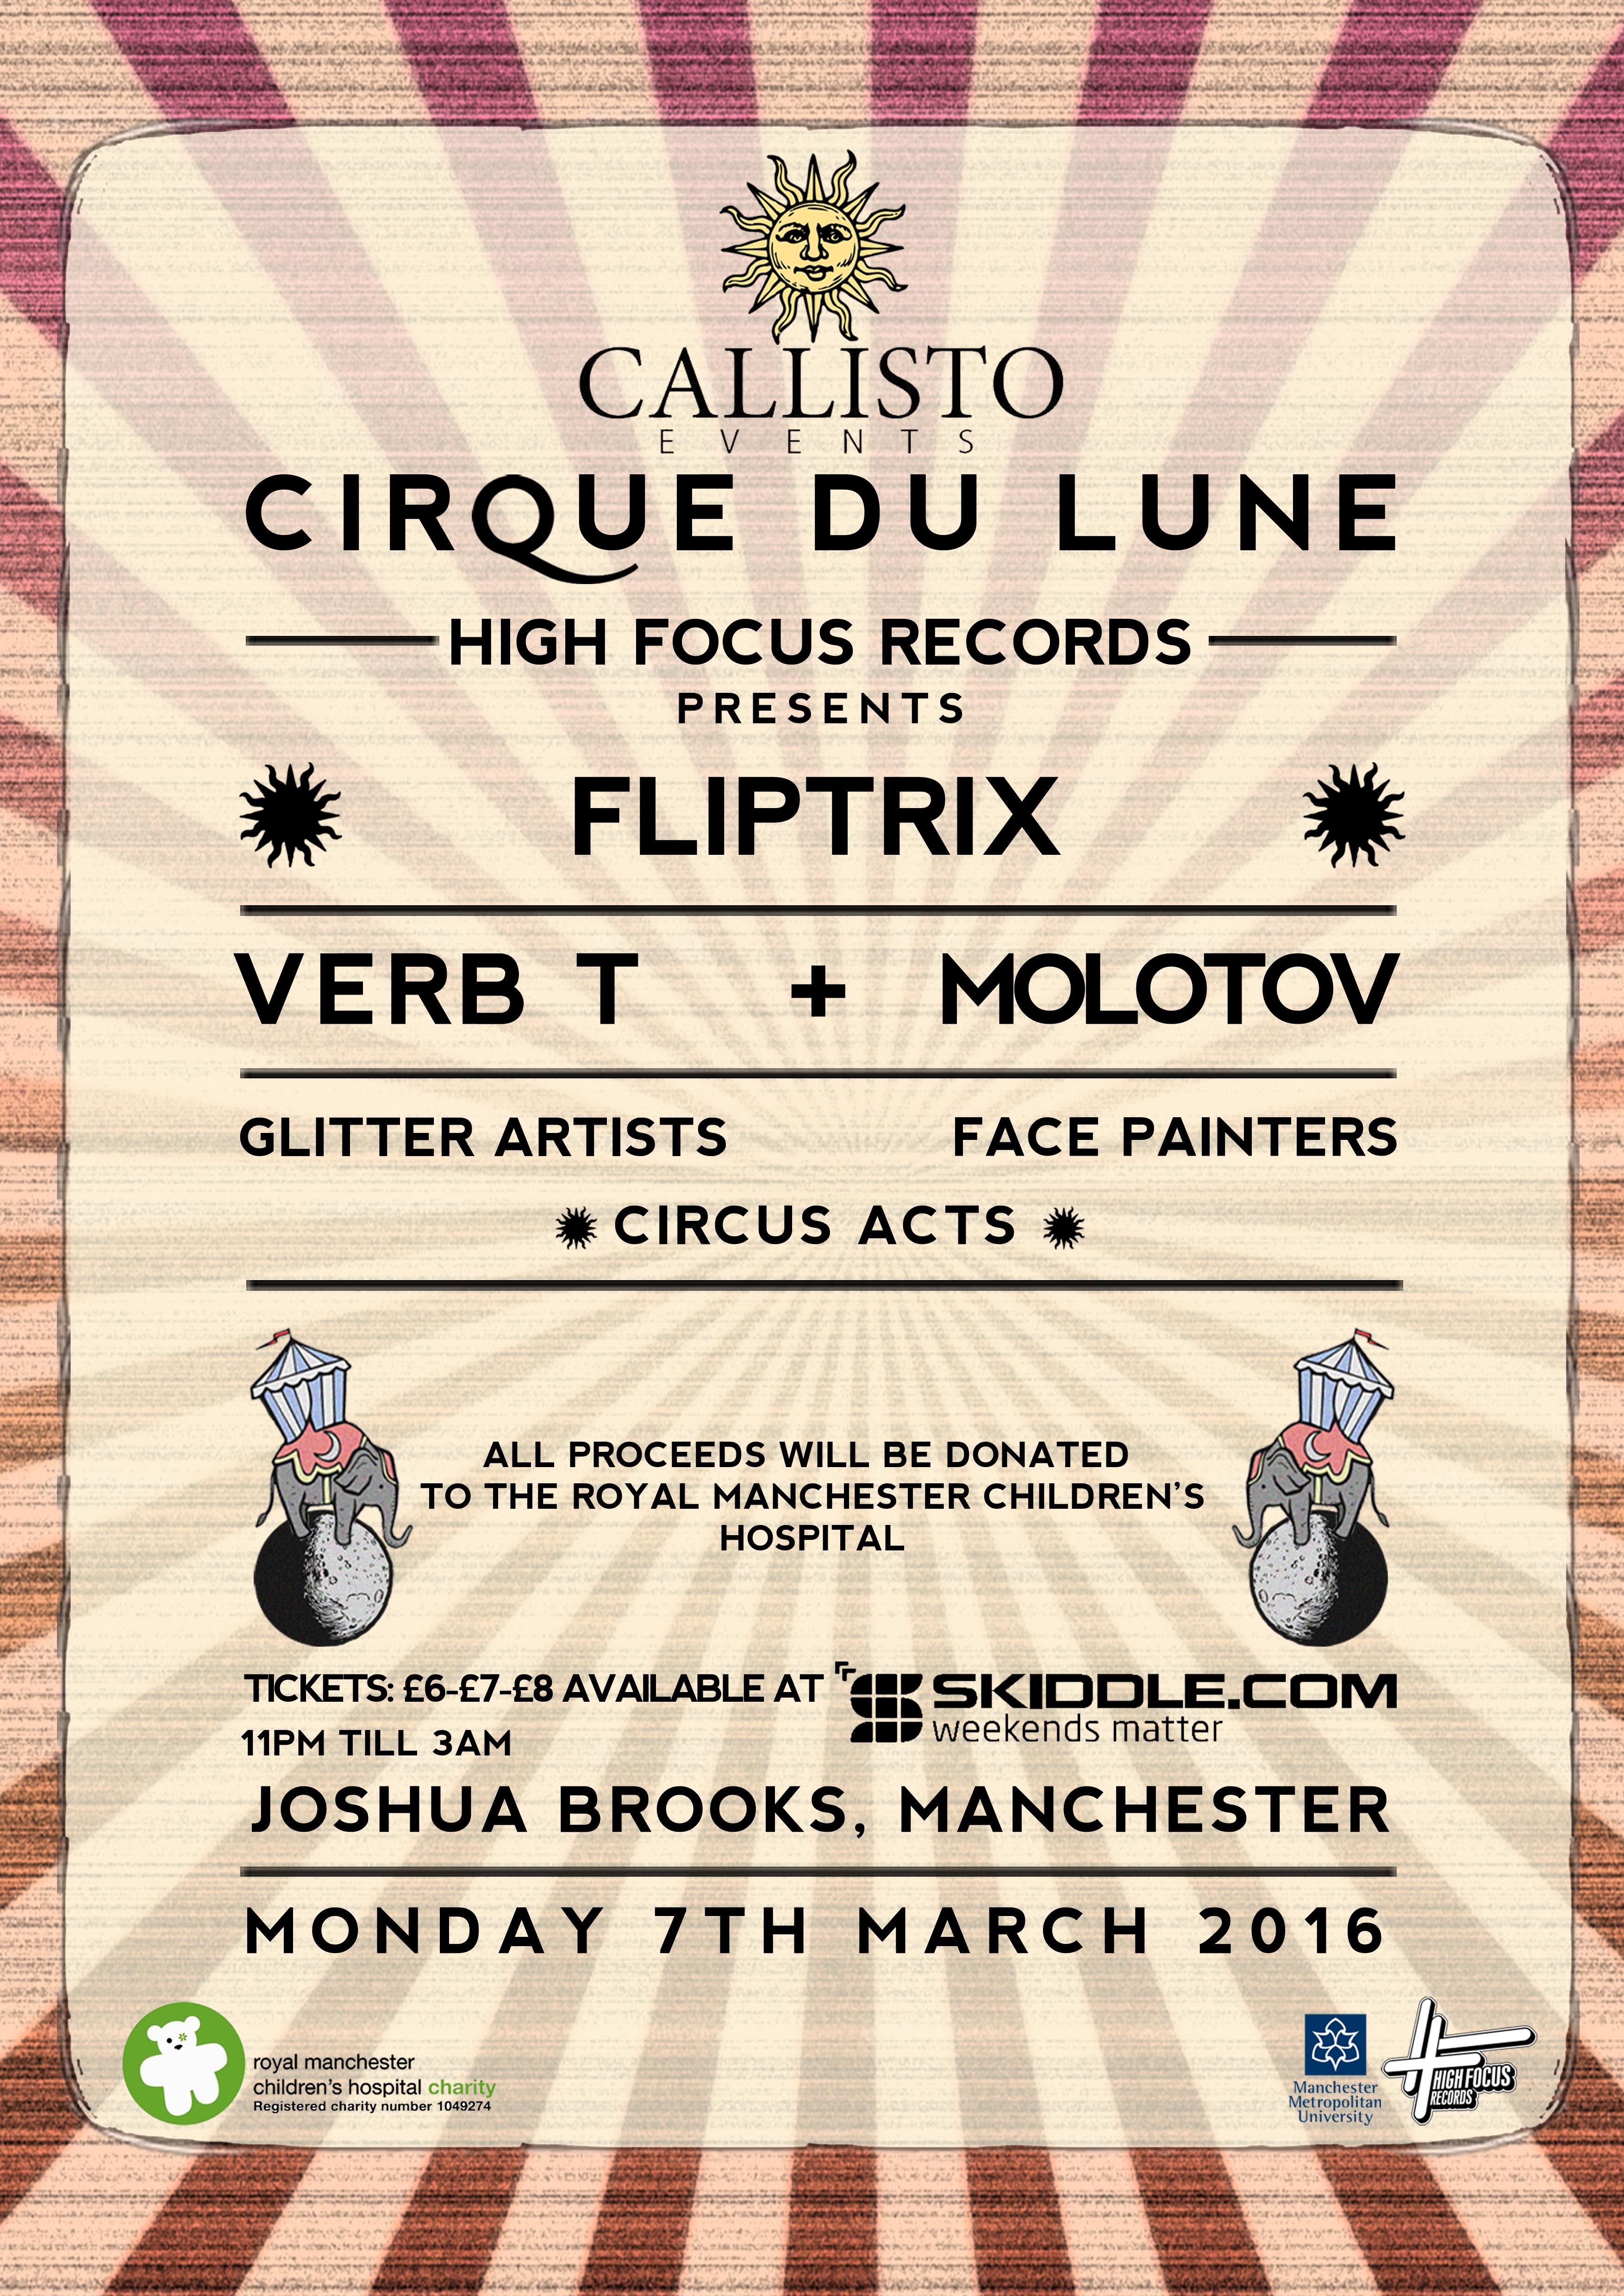 Fliptrix verb t molotov live joshua brooks manchester cirque du lane a3 1 stopboris Images